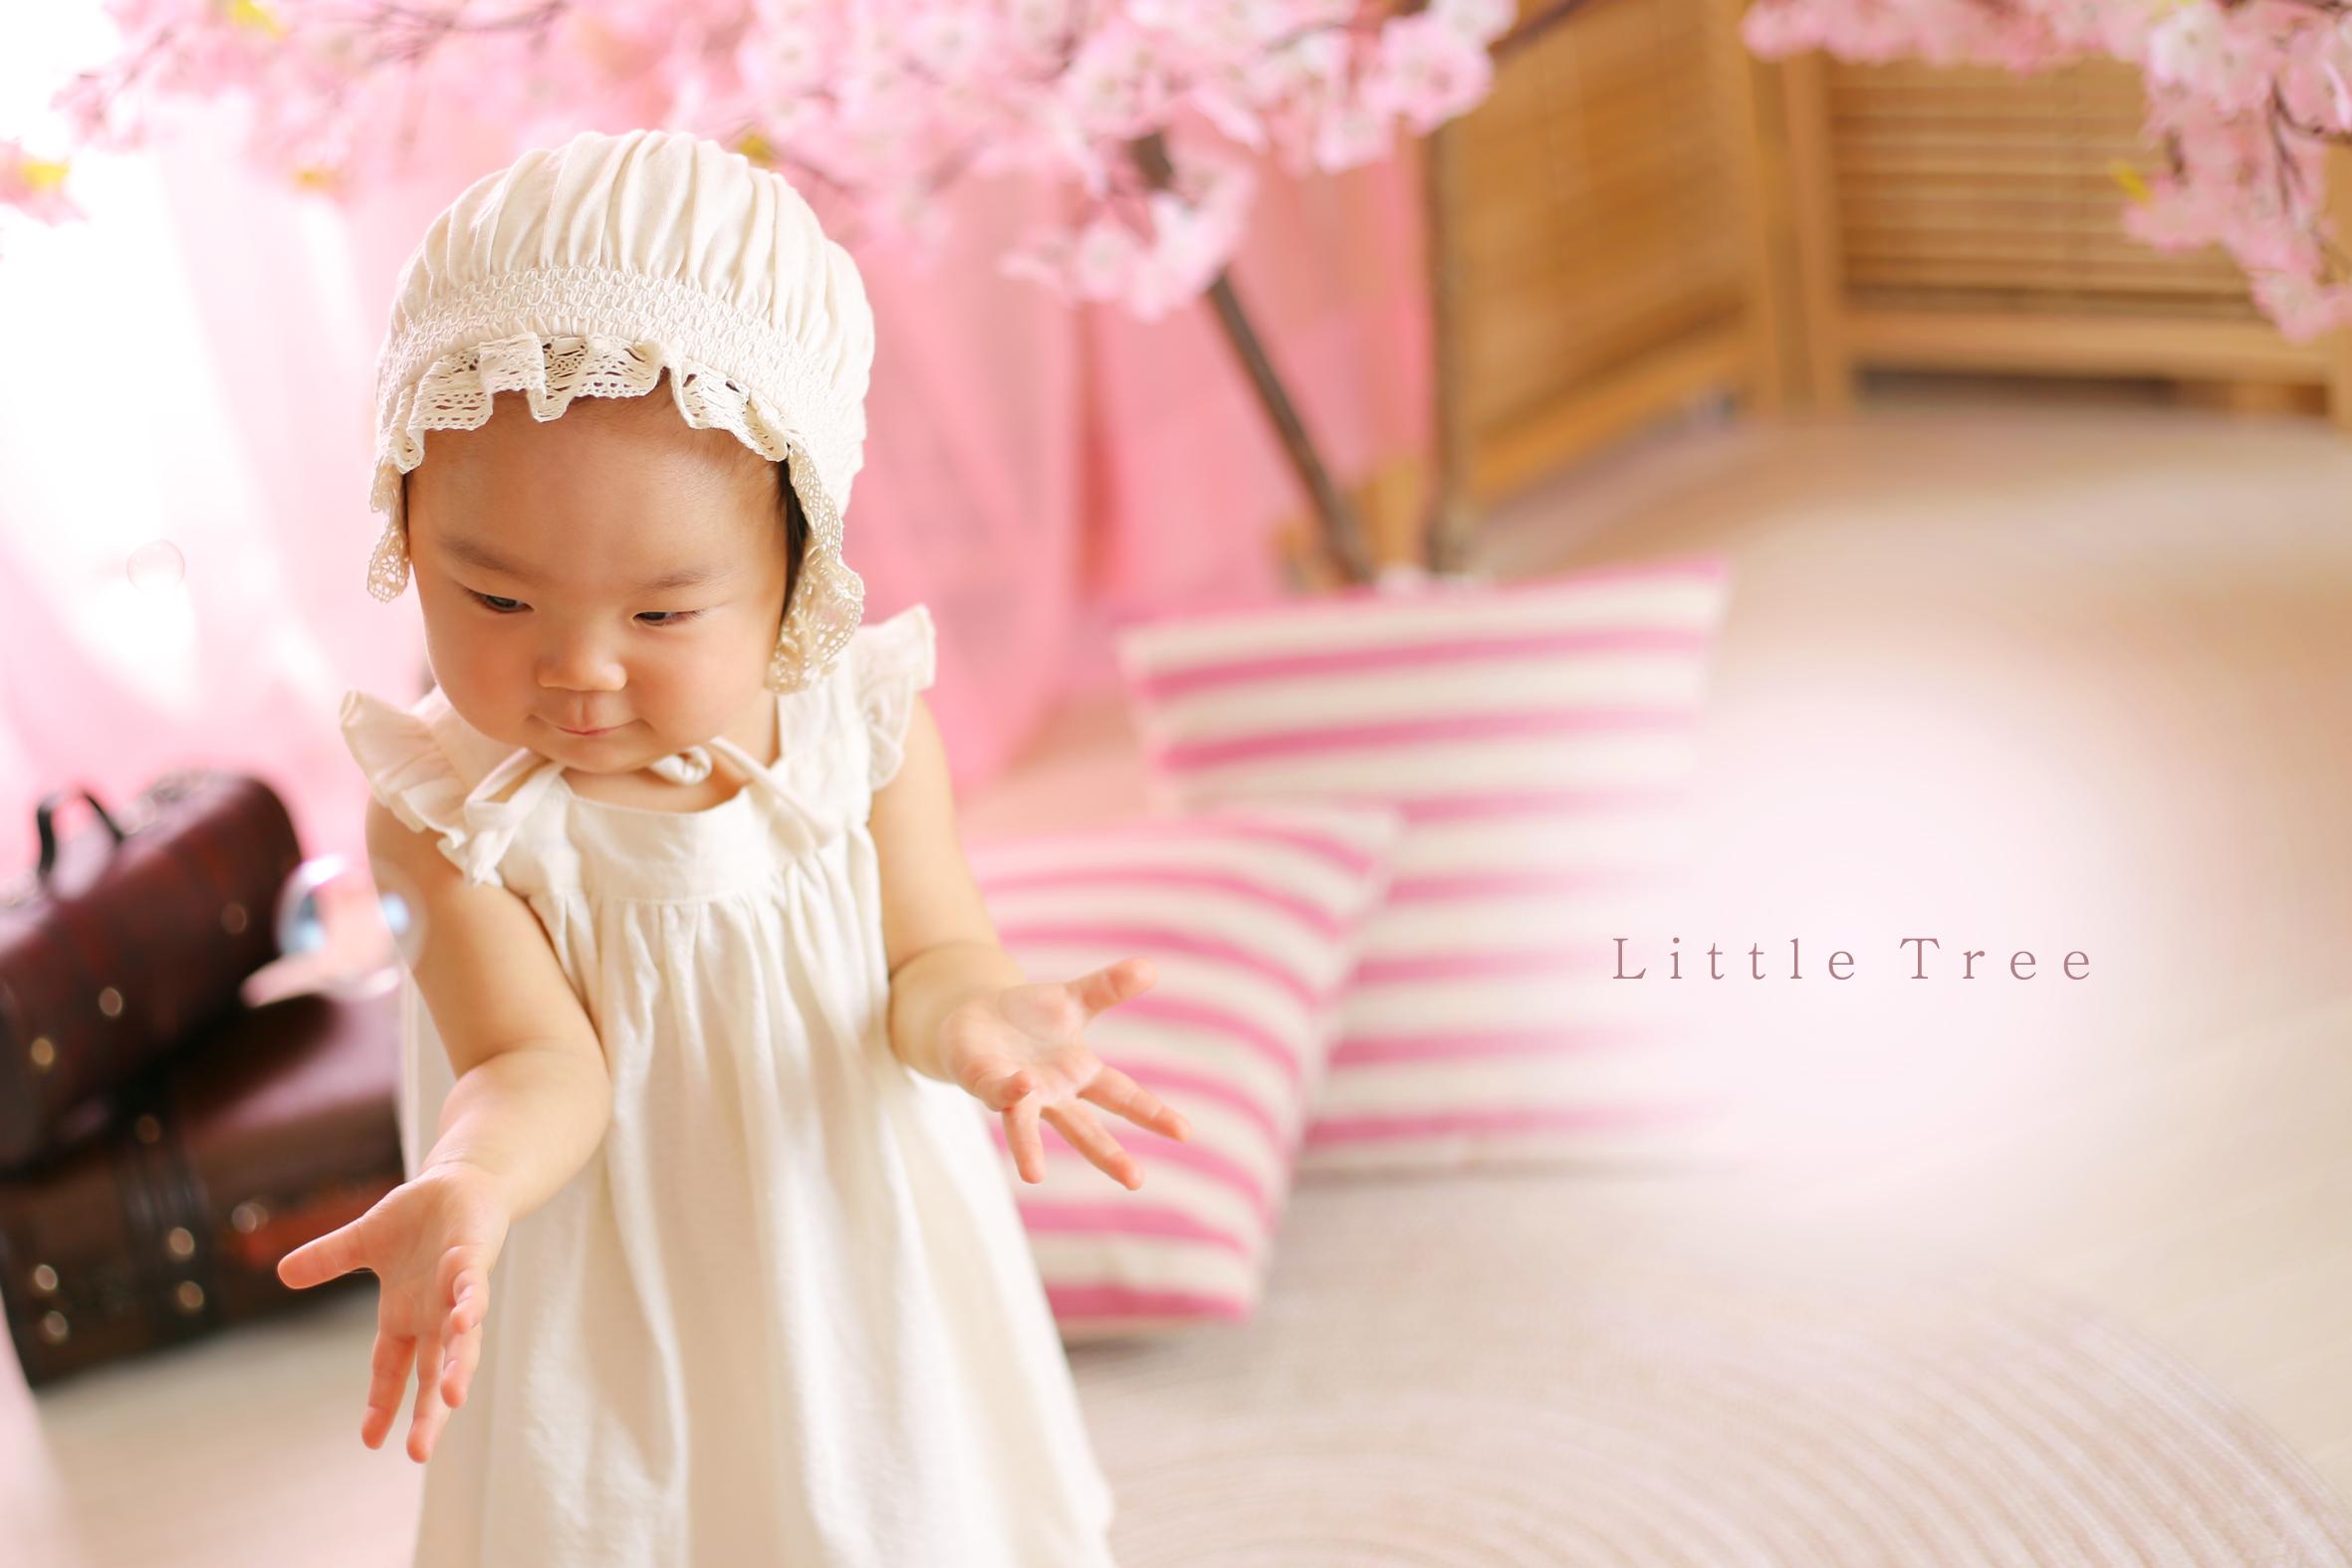 littletree baby151